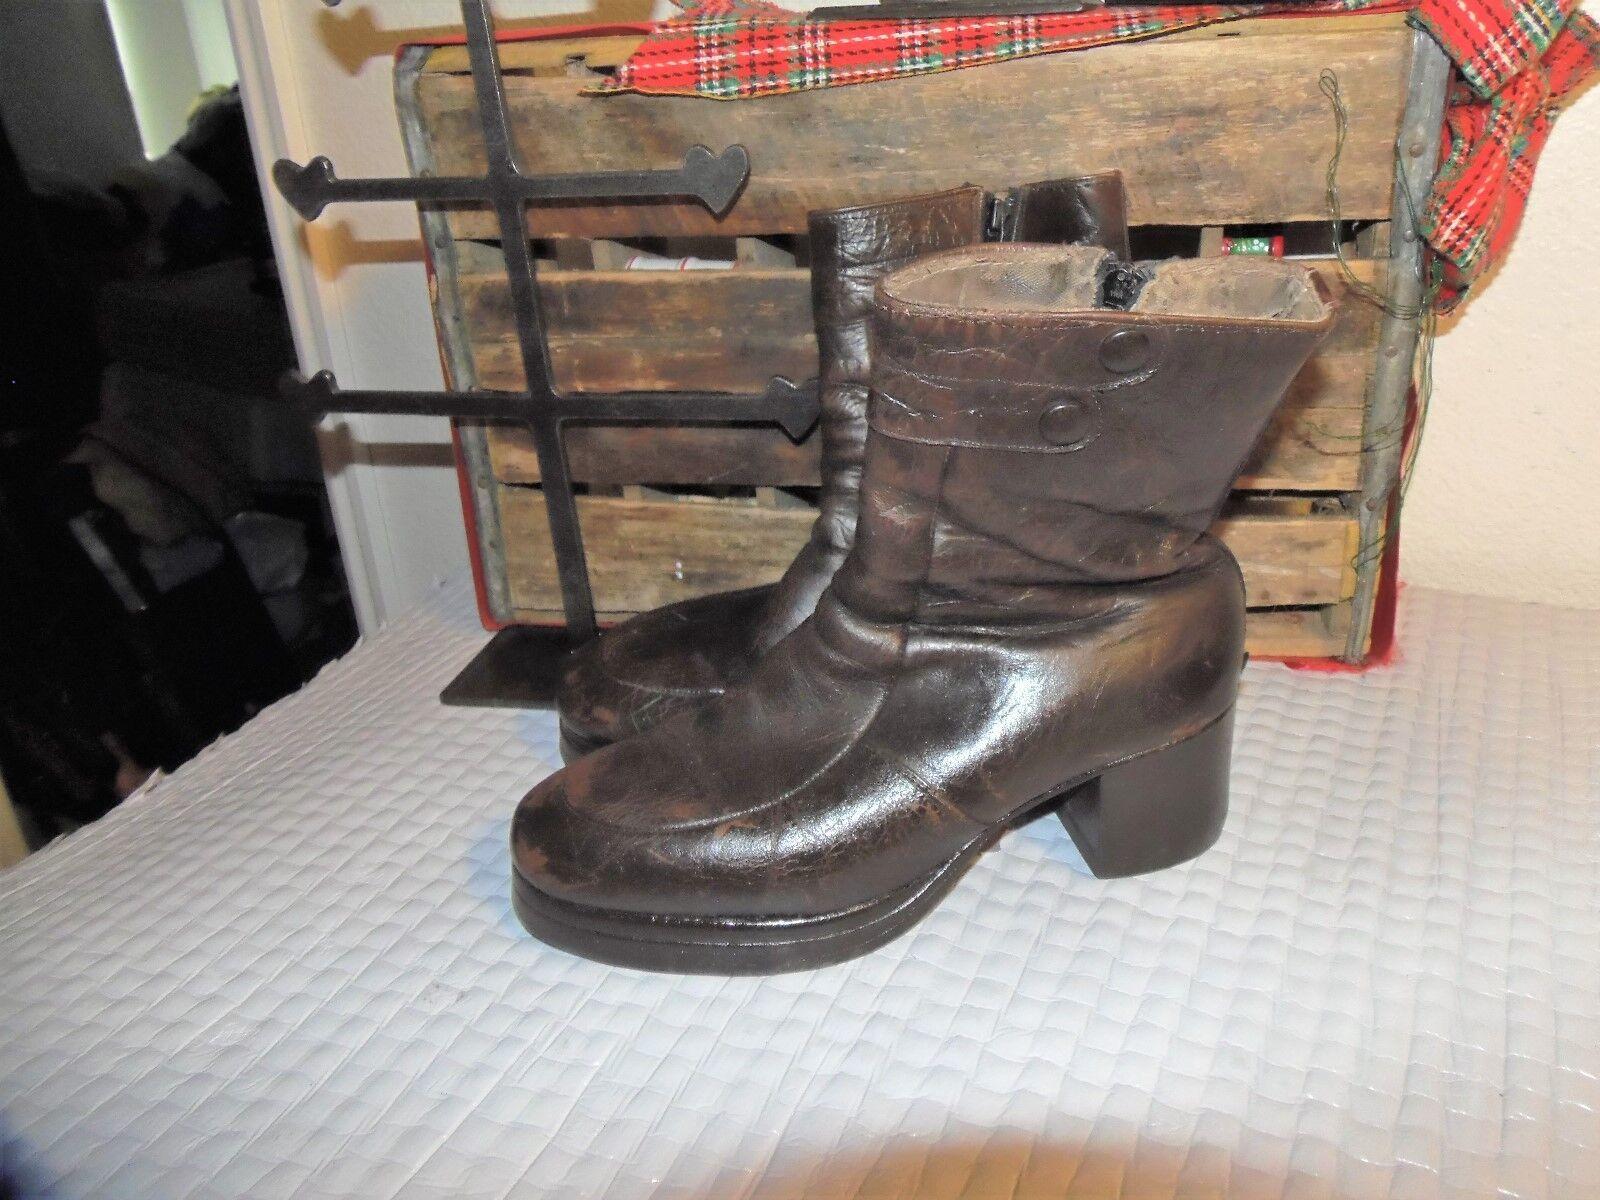 VINTAGE Leather DISCO Stiefel 9.5 9.5 D PLATFORM Stiefel 9.5 DISCO Stiefel 9.5 9.5 99317b